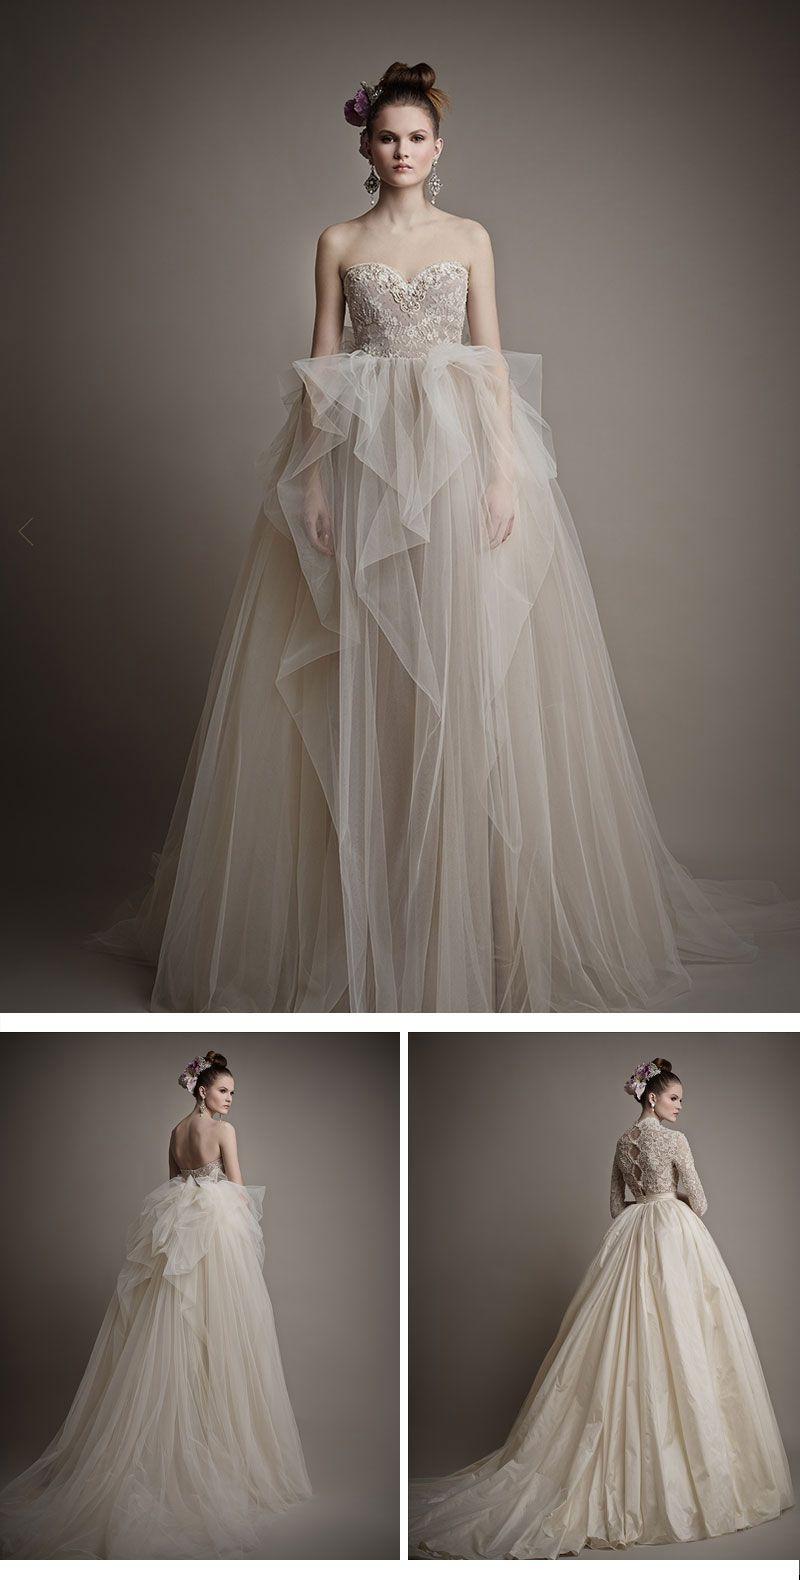 Glamouröse Ersa Atelier Brautkleider Kollektion 2015 | Atelier ...